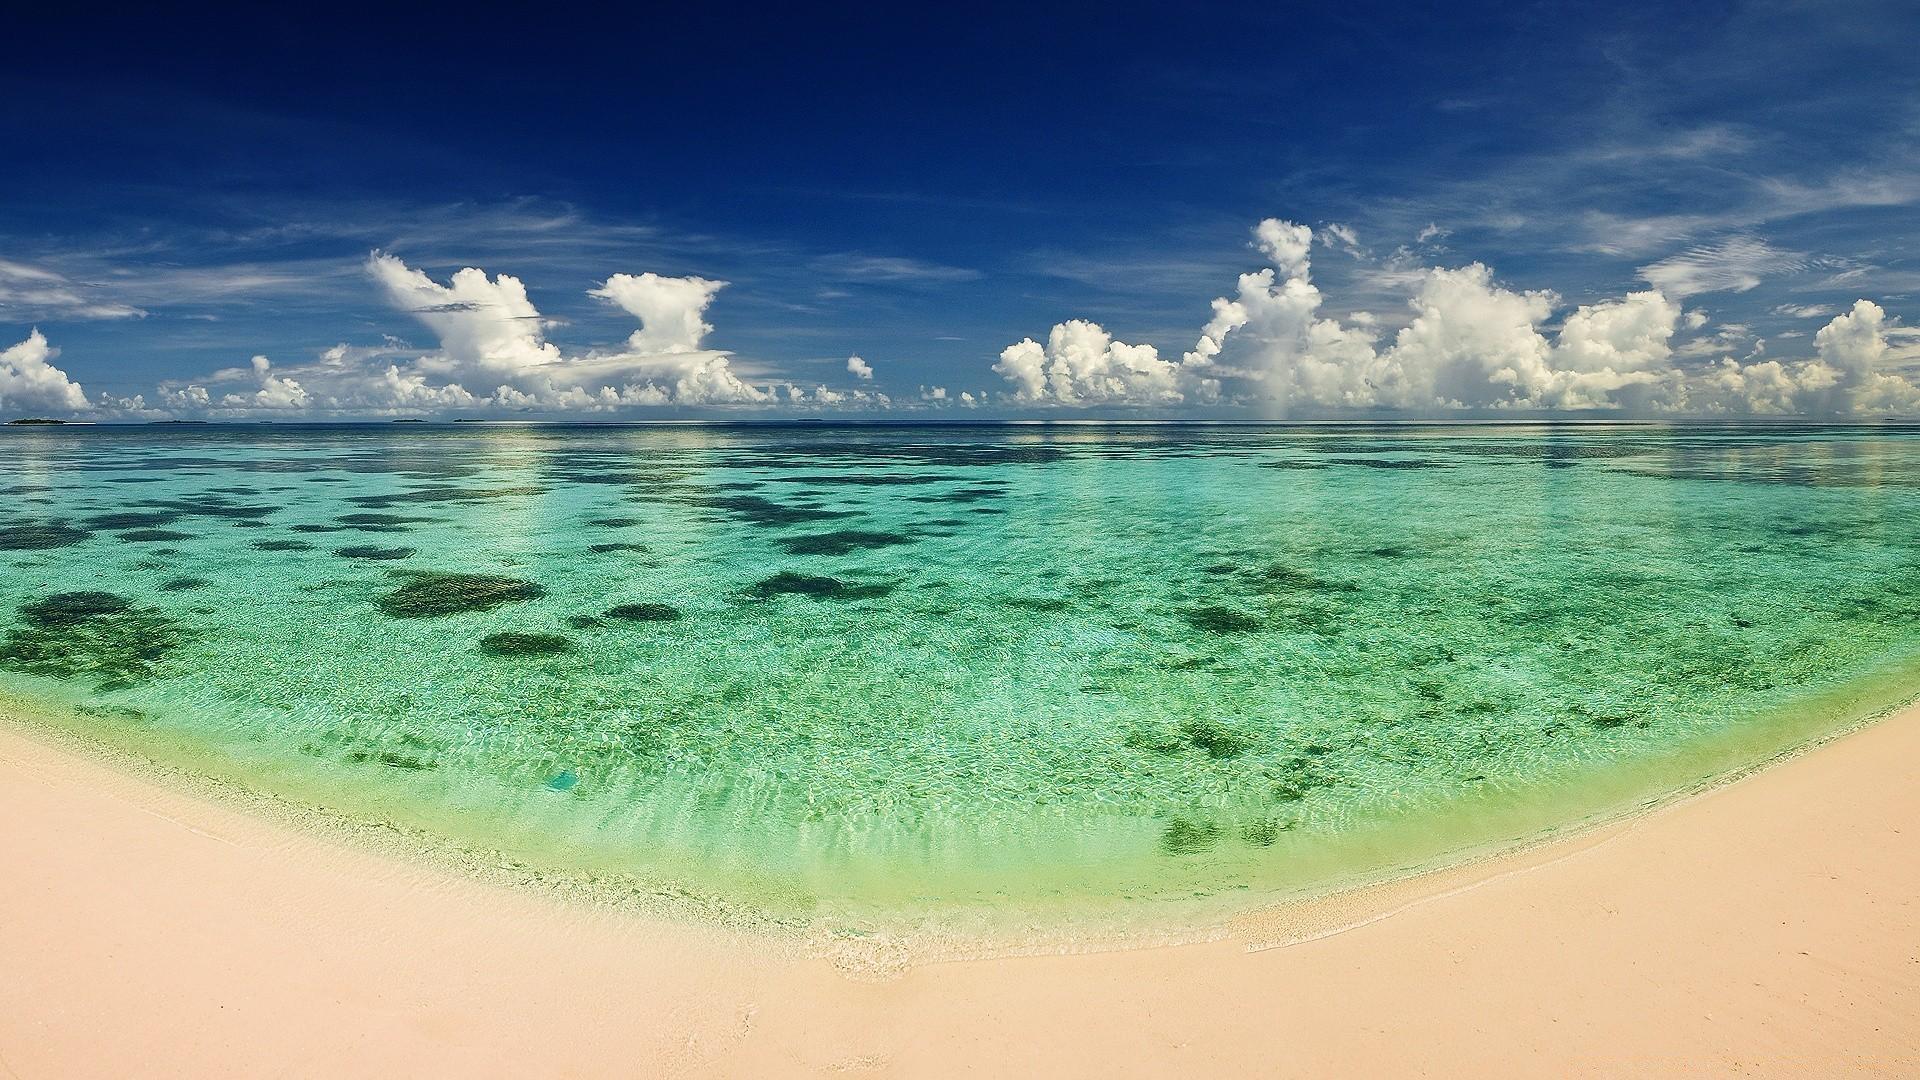 Beach Desktop Wallpapers For Free